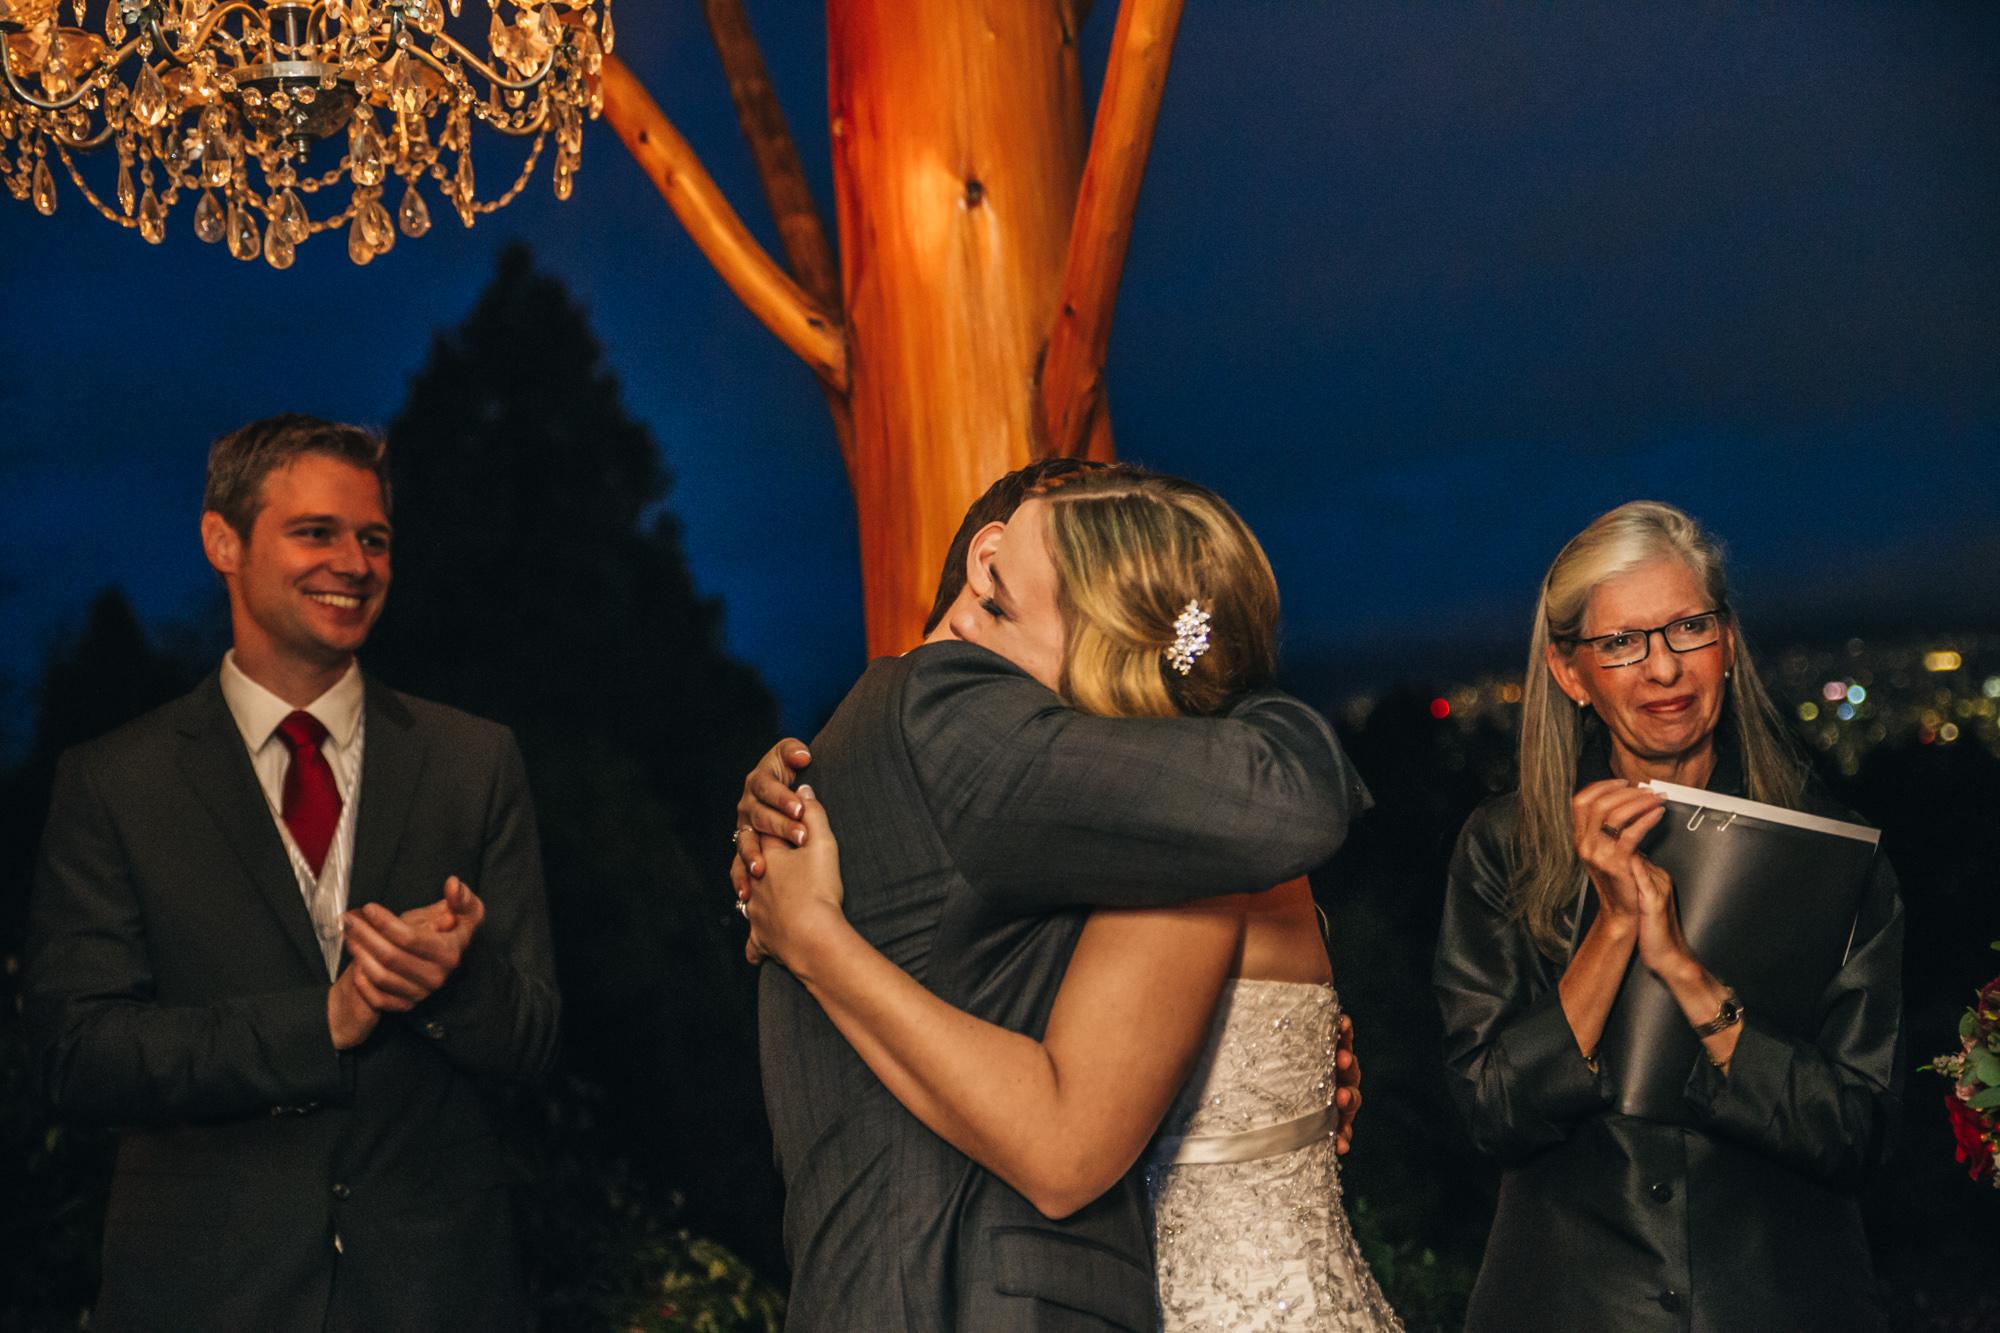 37-seasons-in-the-park-wedding-ceremony.jpg